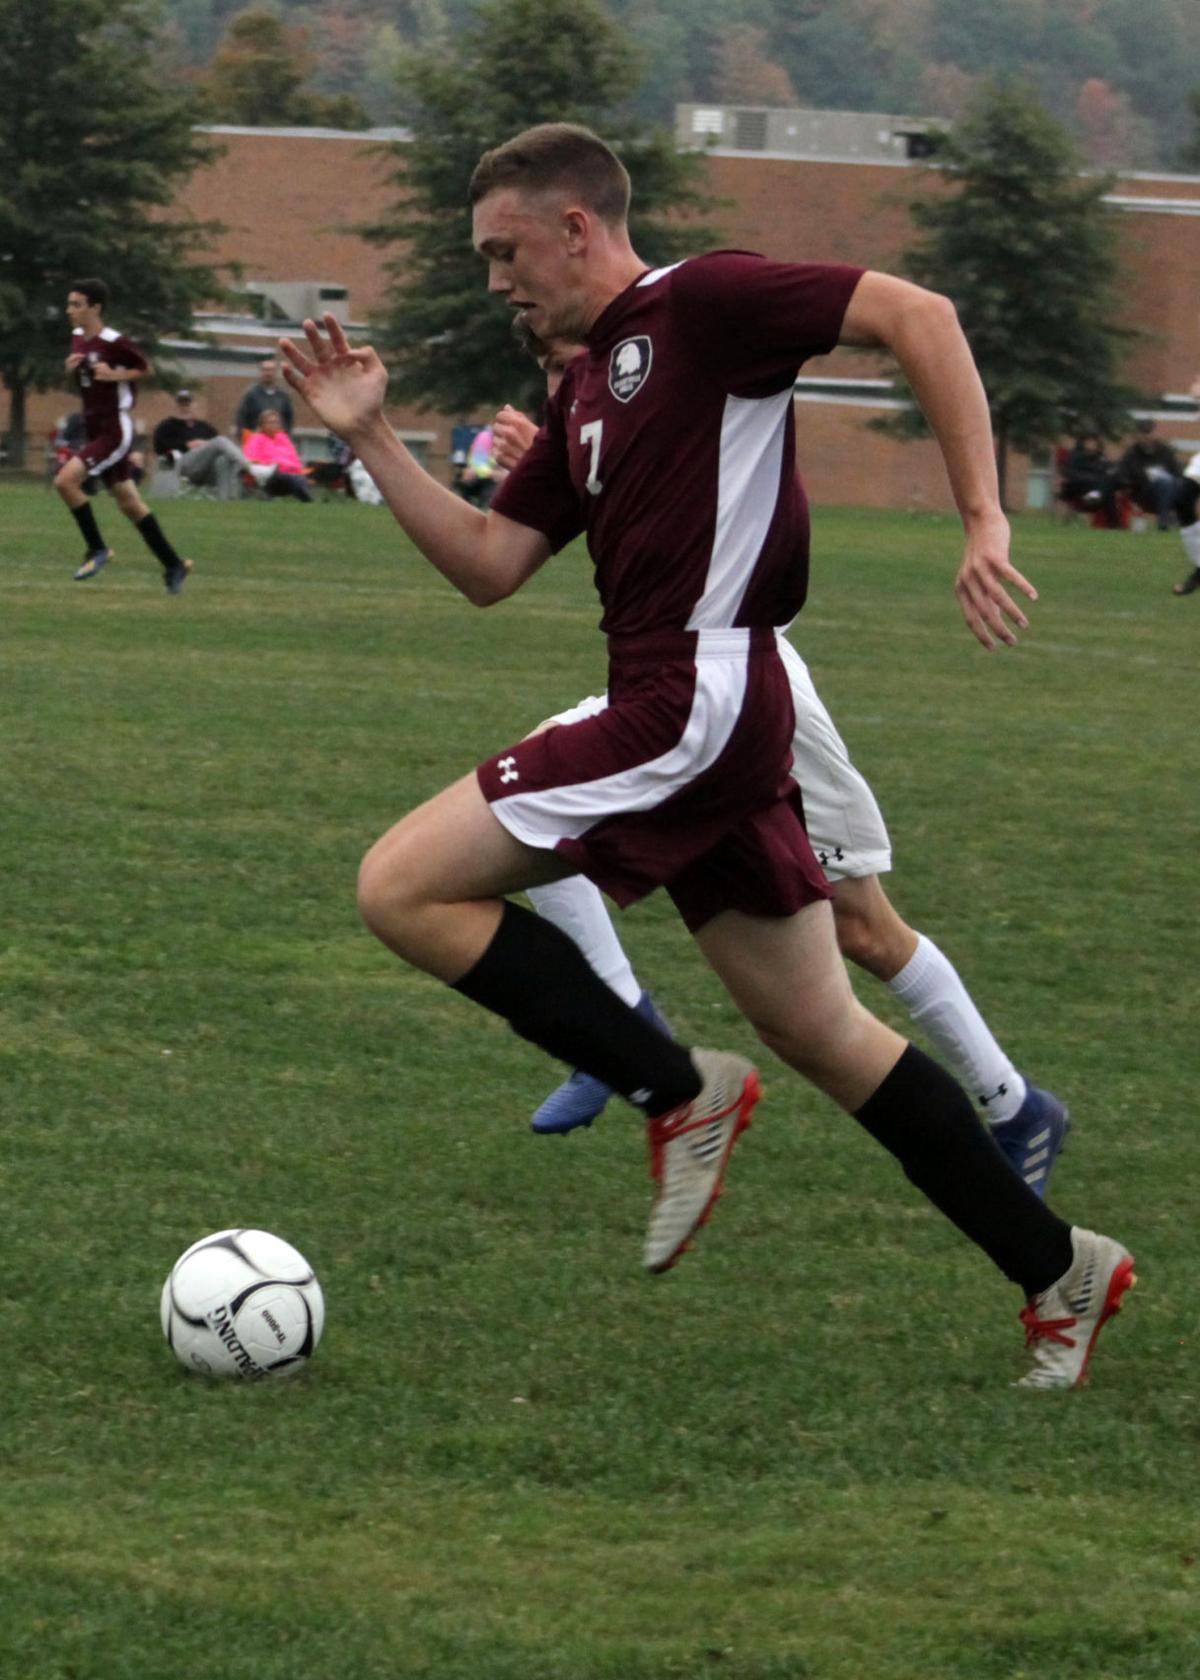 Ellicottville SalamancaCLV boys soccer